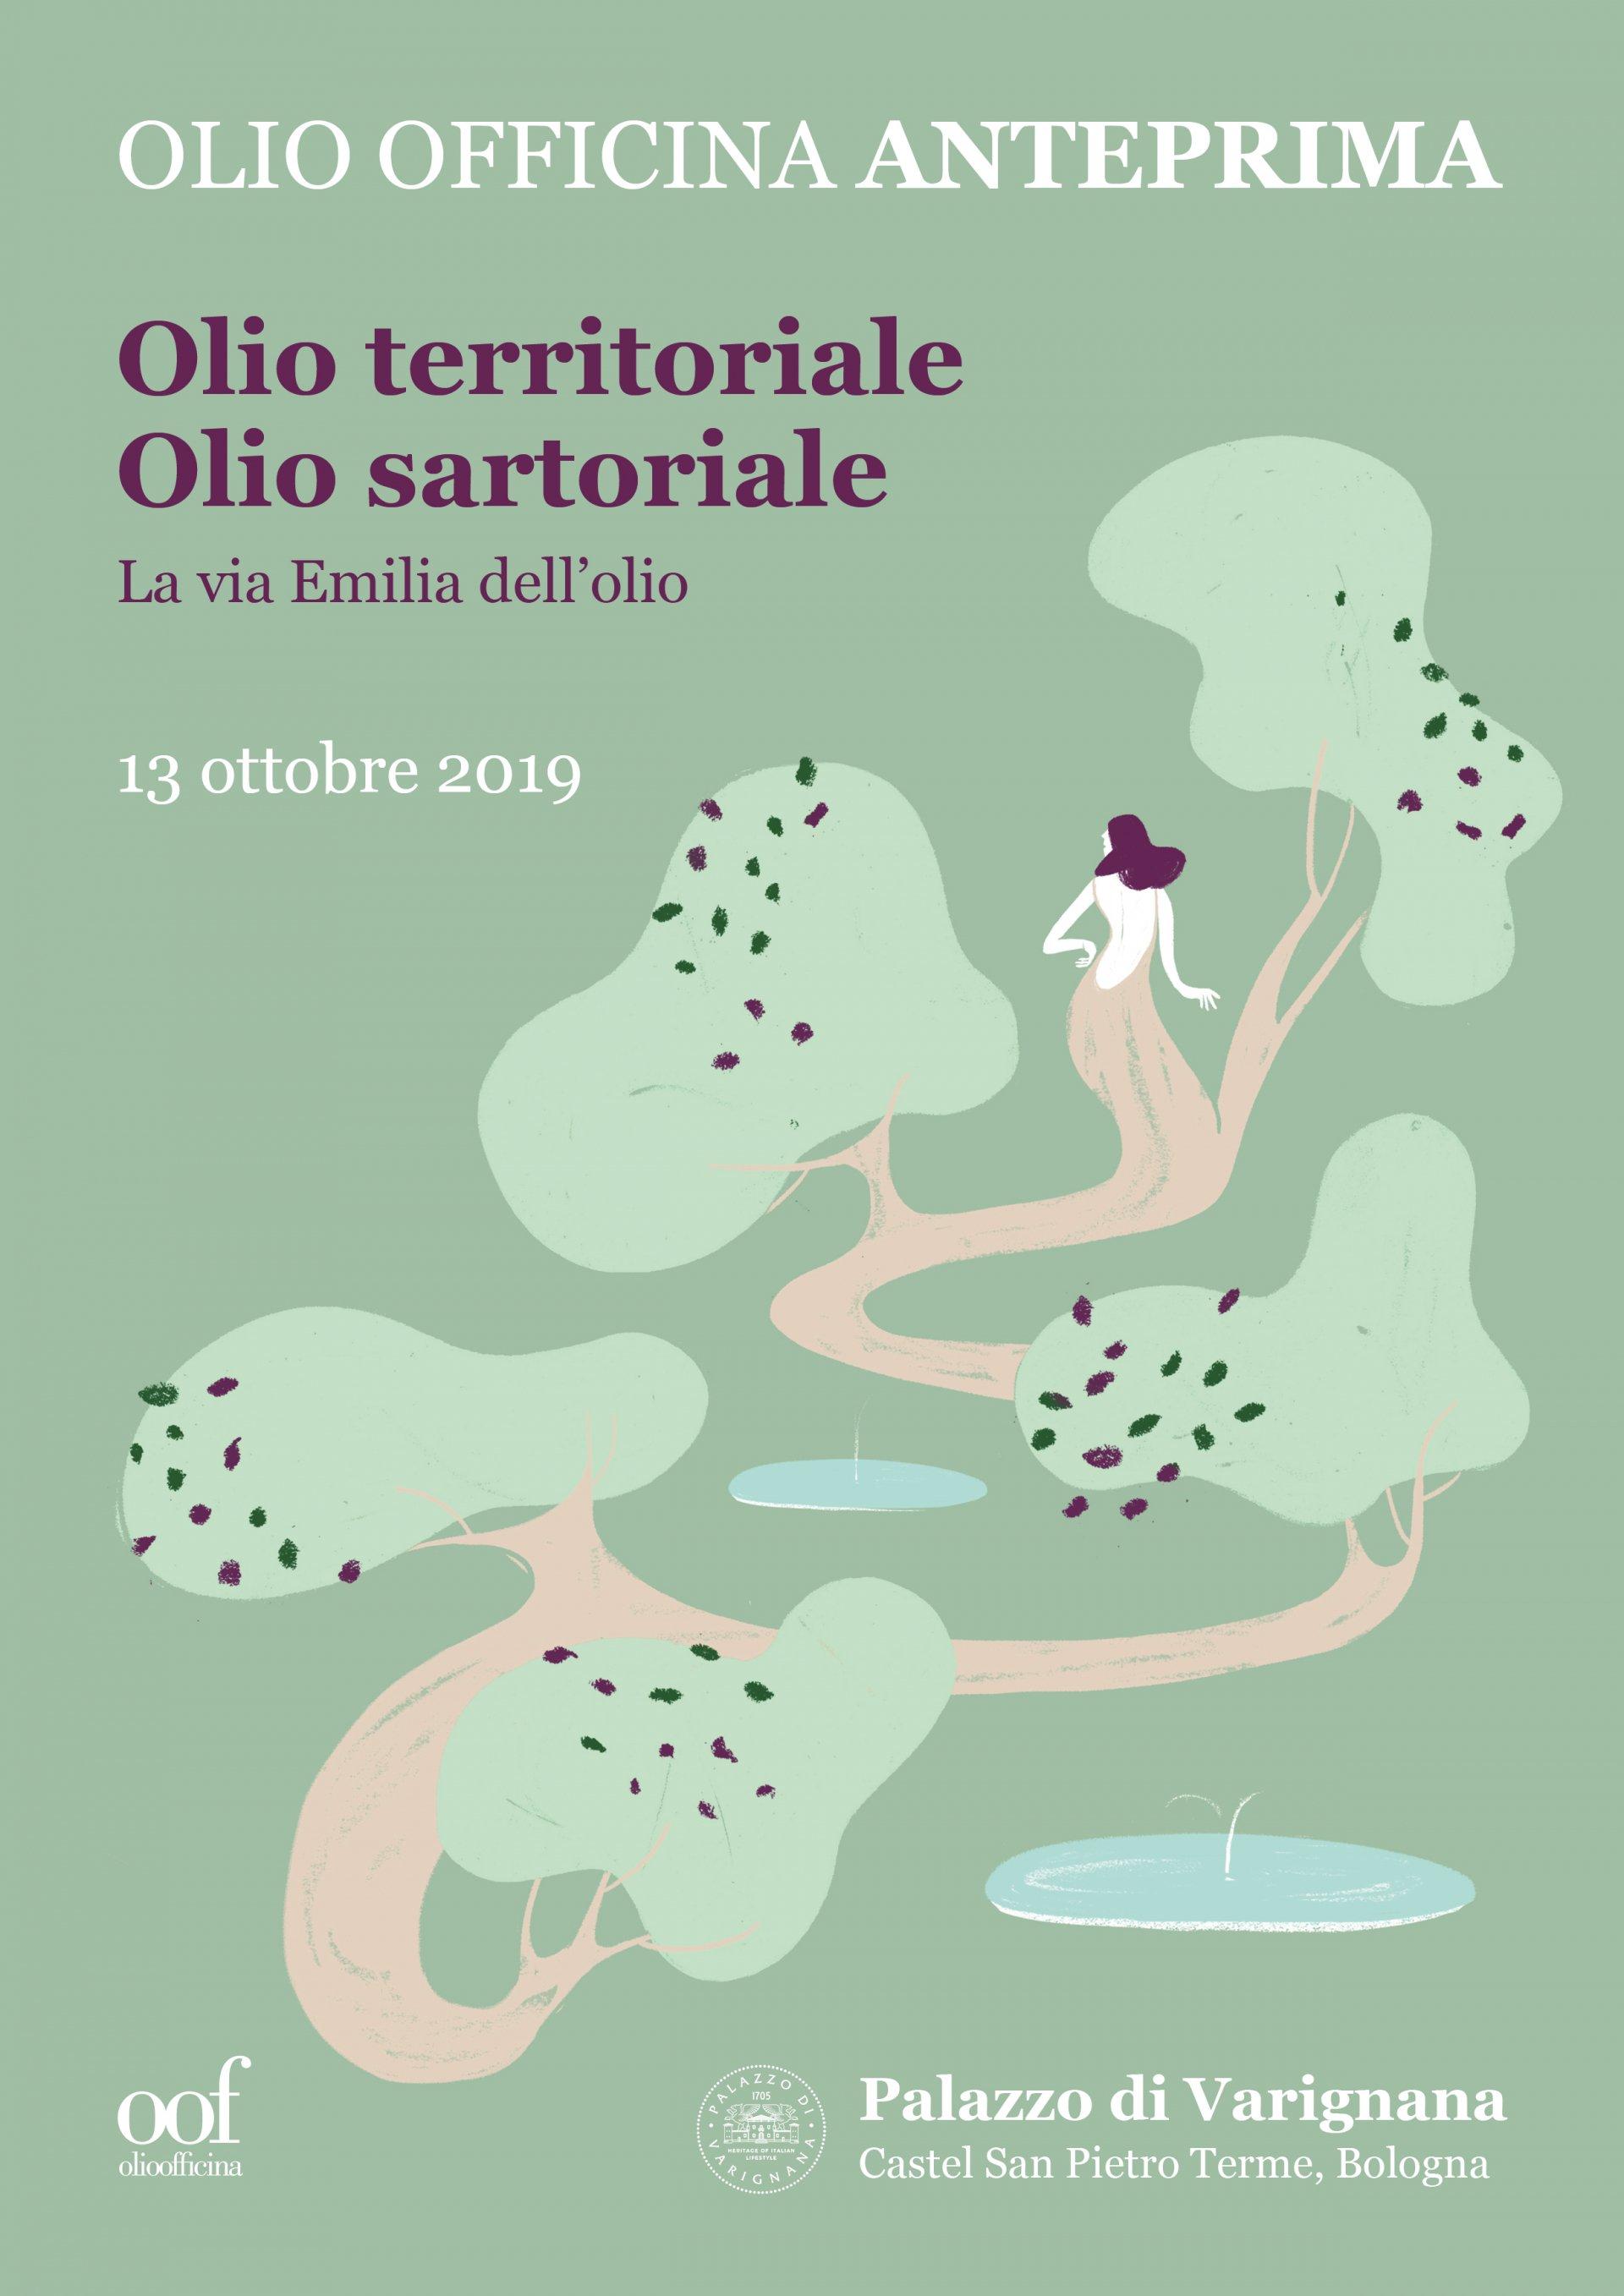 Olio Officina Anteprima 2019 sui colli bolognesi